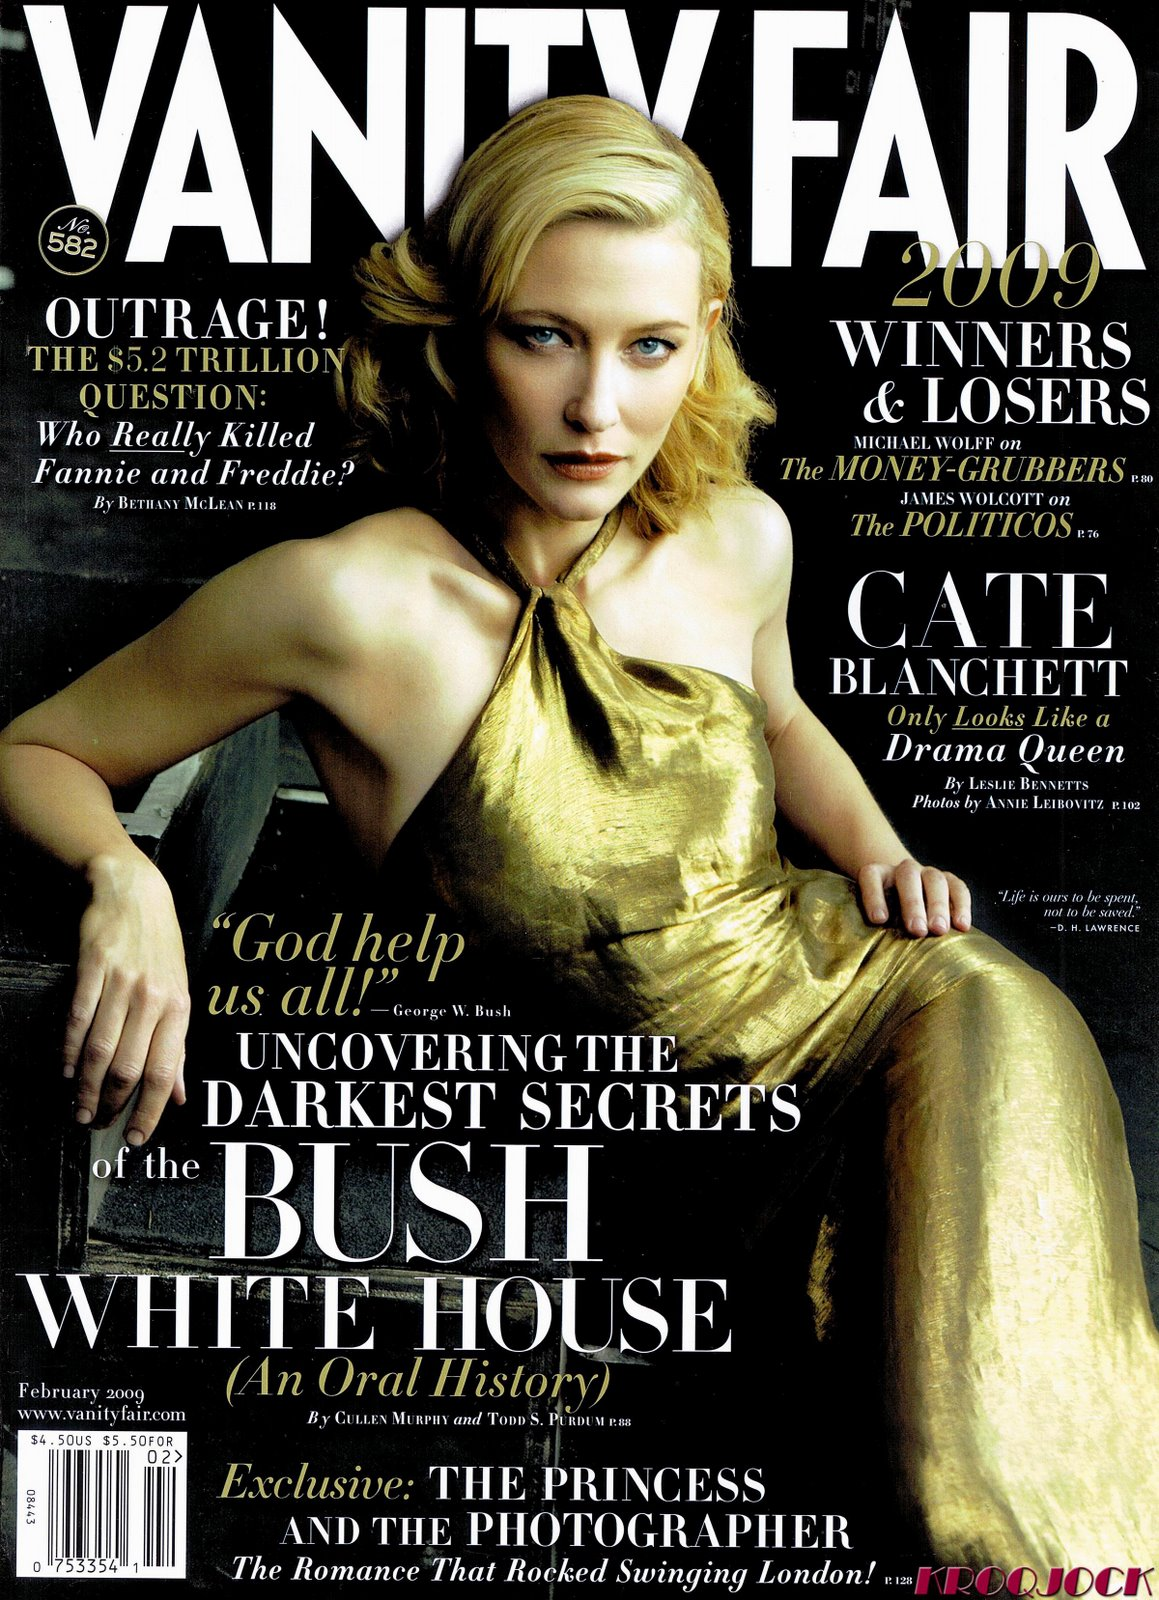 http://2.bp.blogspot.com/_2VfVkjQeiYE/SWmwefqp2-I/AAAAAAAAAUY/sdPRnTbnYGc/s1600/09538_Cate_Blanchett.VANITY_FAIR.February_2009.Scanned_by_KROQJOCK.UHQ1_122_672lo.jpg